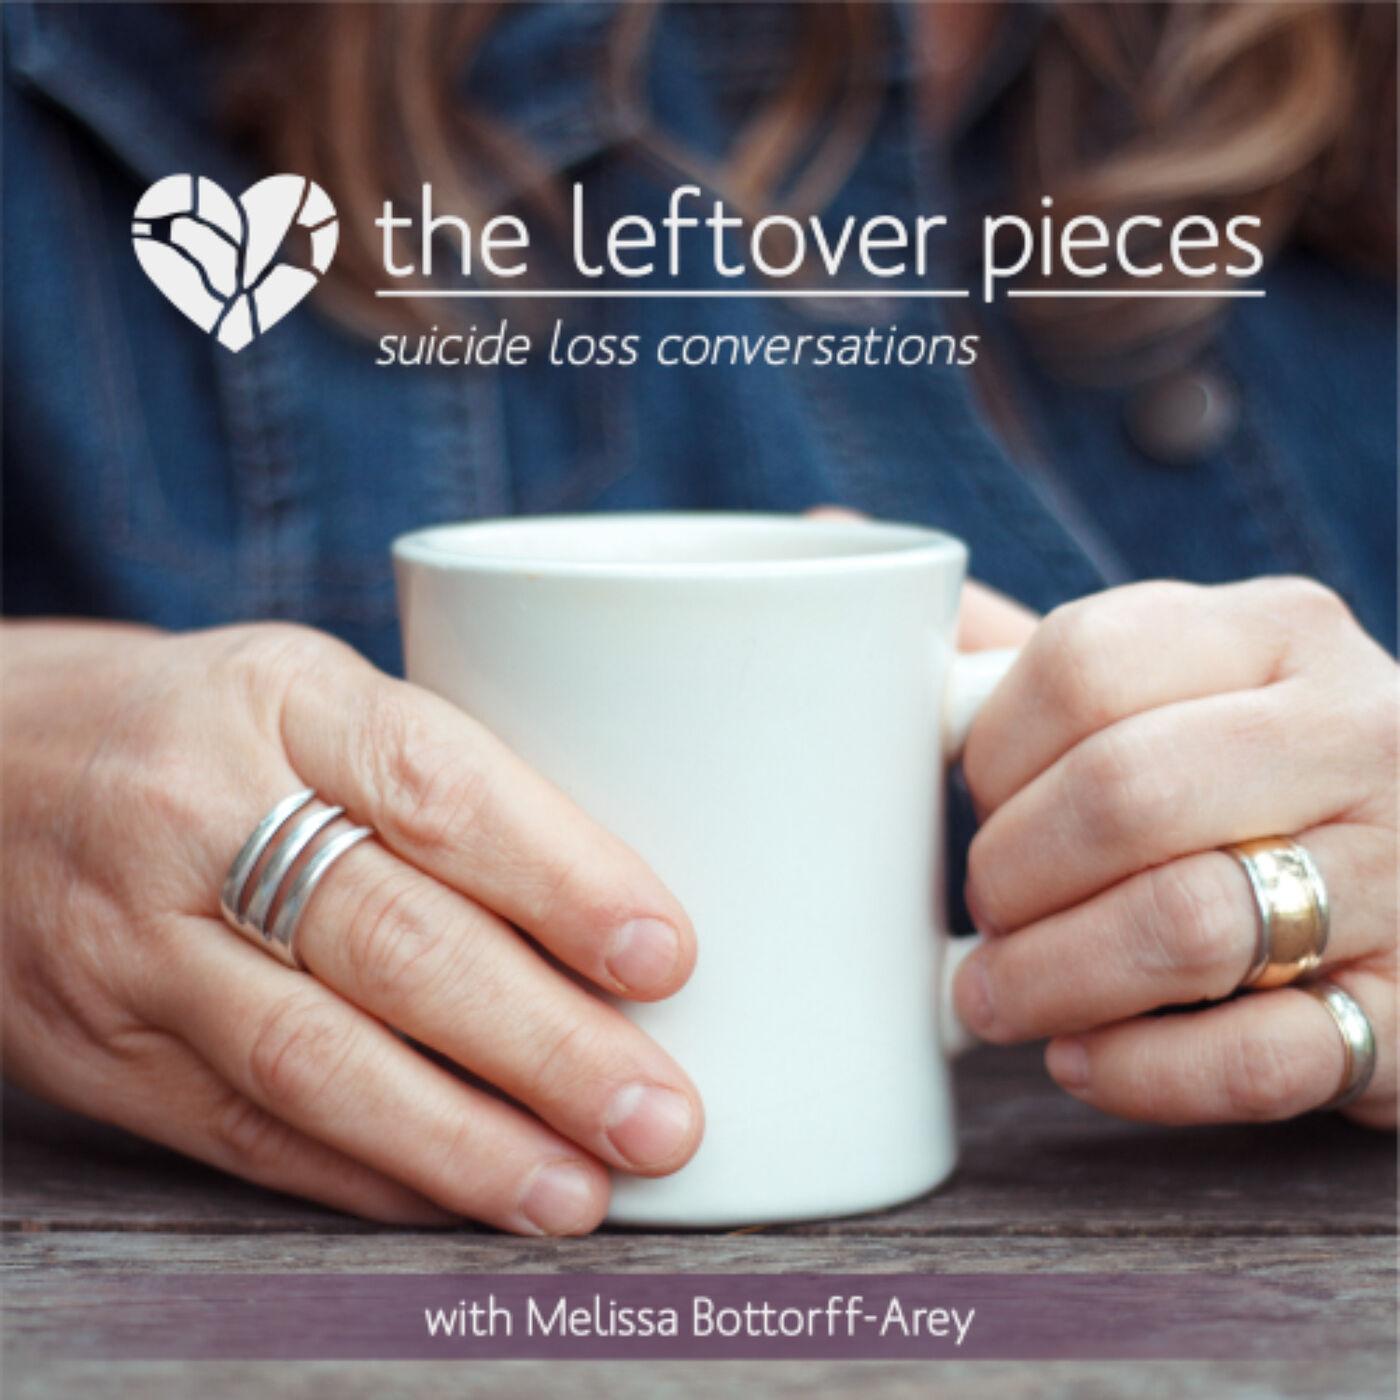 The Leftover Pieces; Suicide Loss Conversations